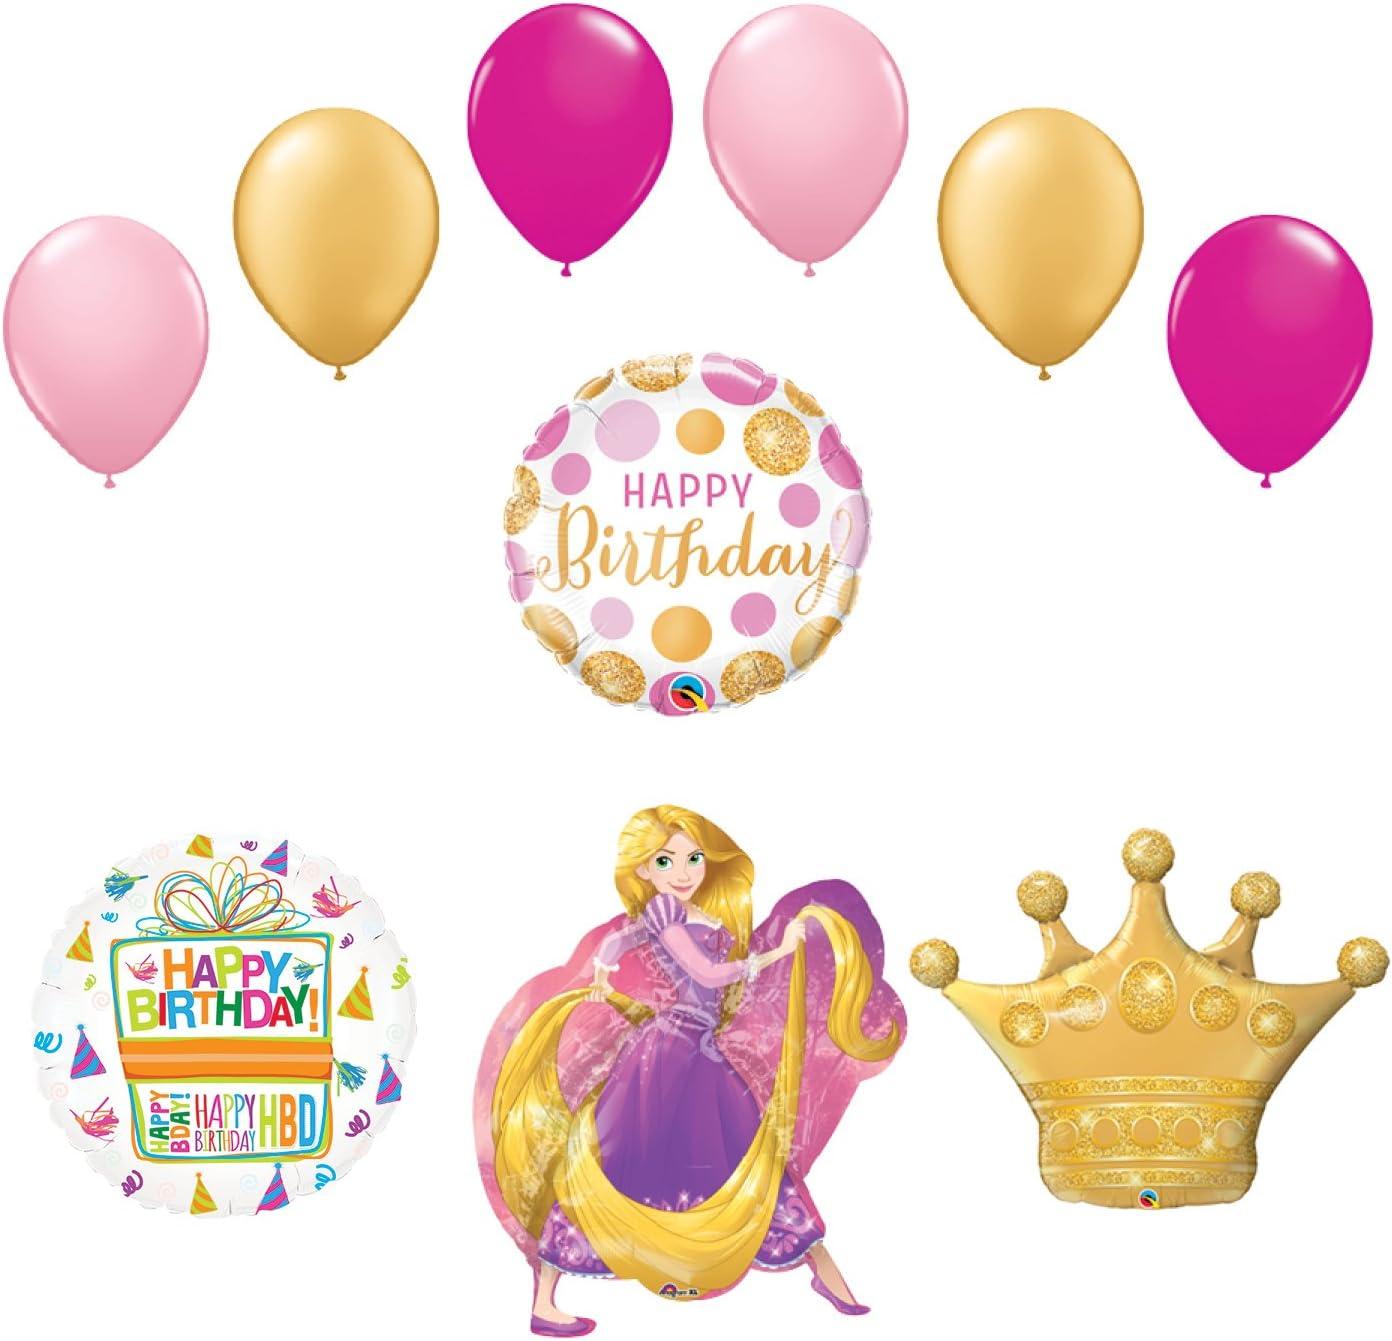 Princess Rapunzel Party Supplies Happy Birthday Balloon Bouquet Decorations